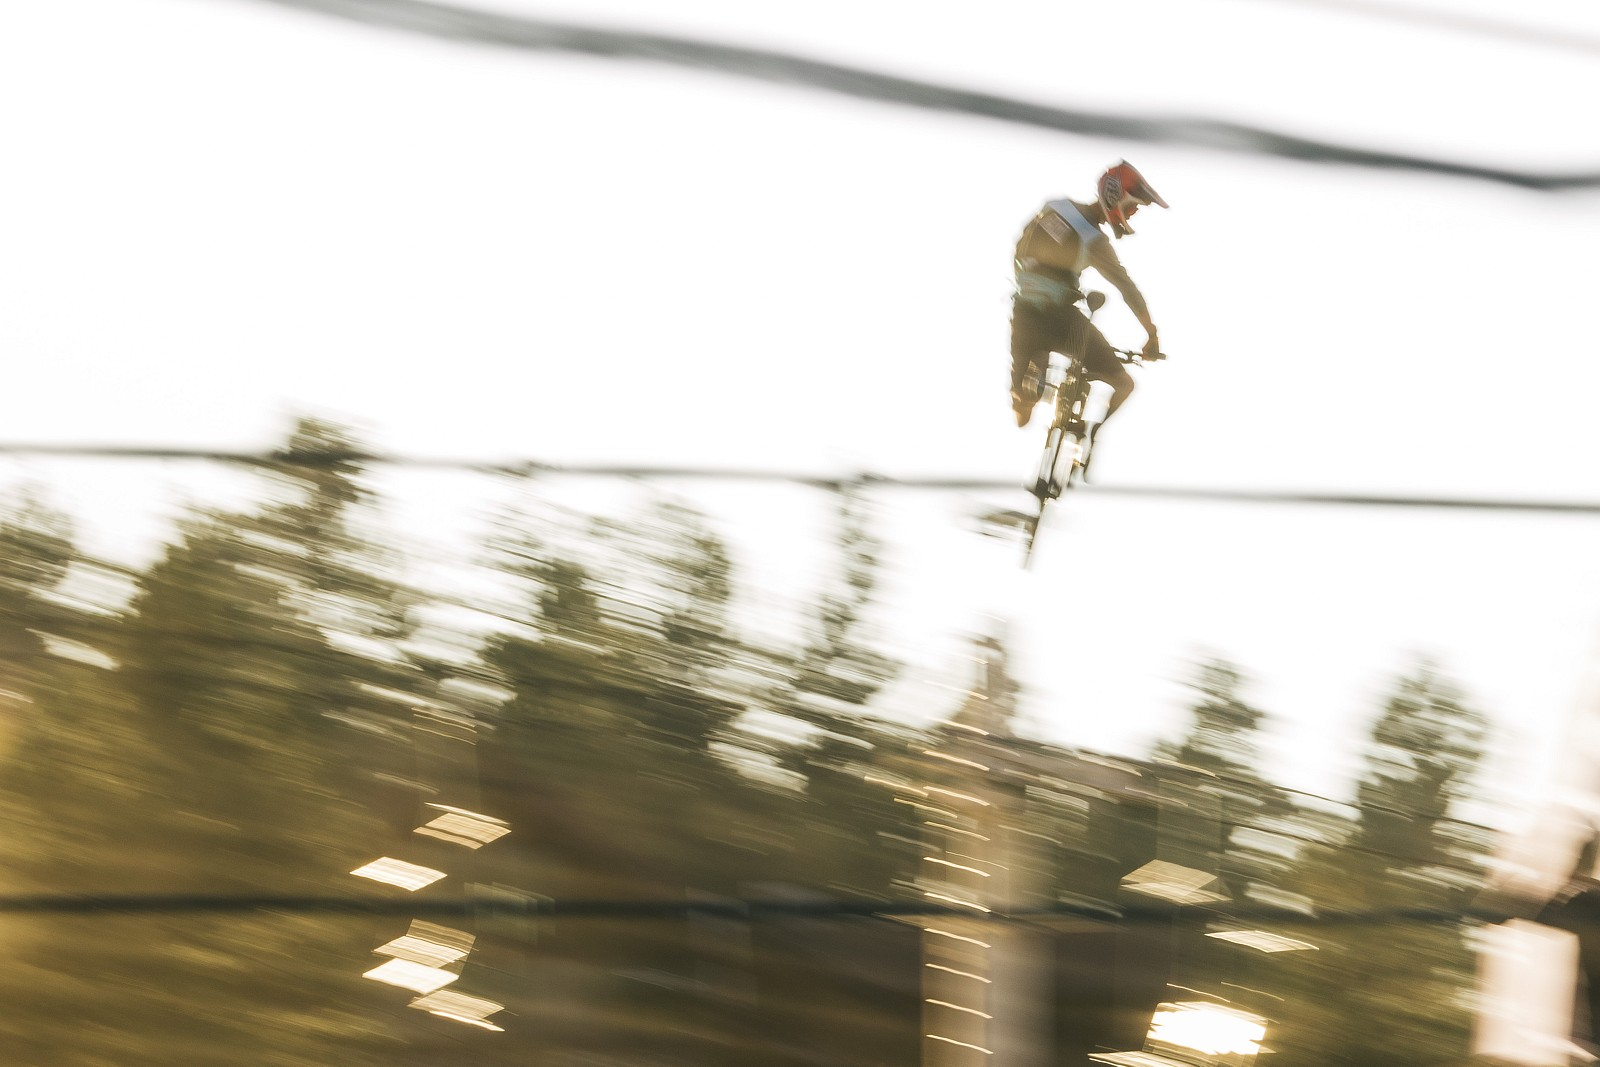 2019USOpenMTBWhip yellow-29 - ALeedomPhotography - Mountain Biking Pictures - Vital MTB